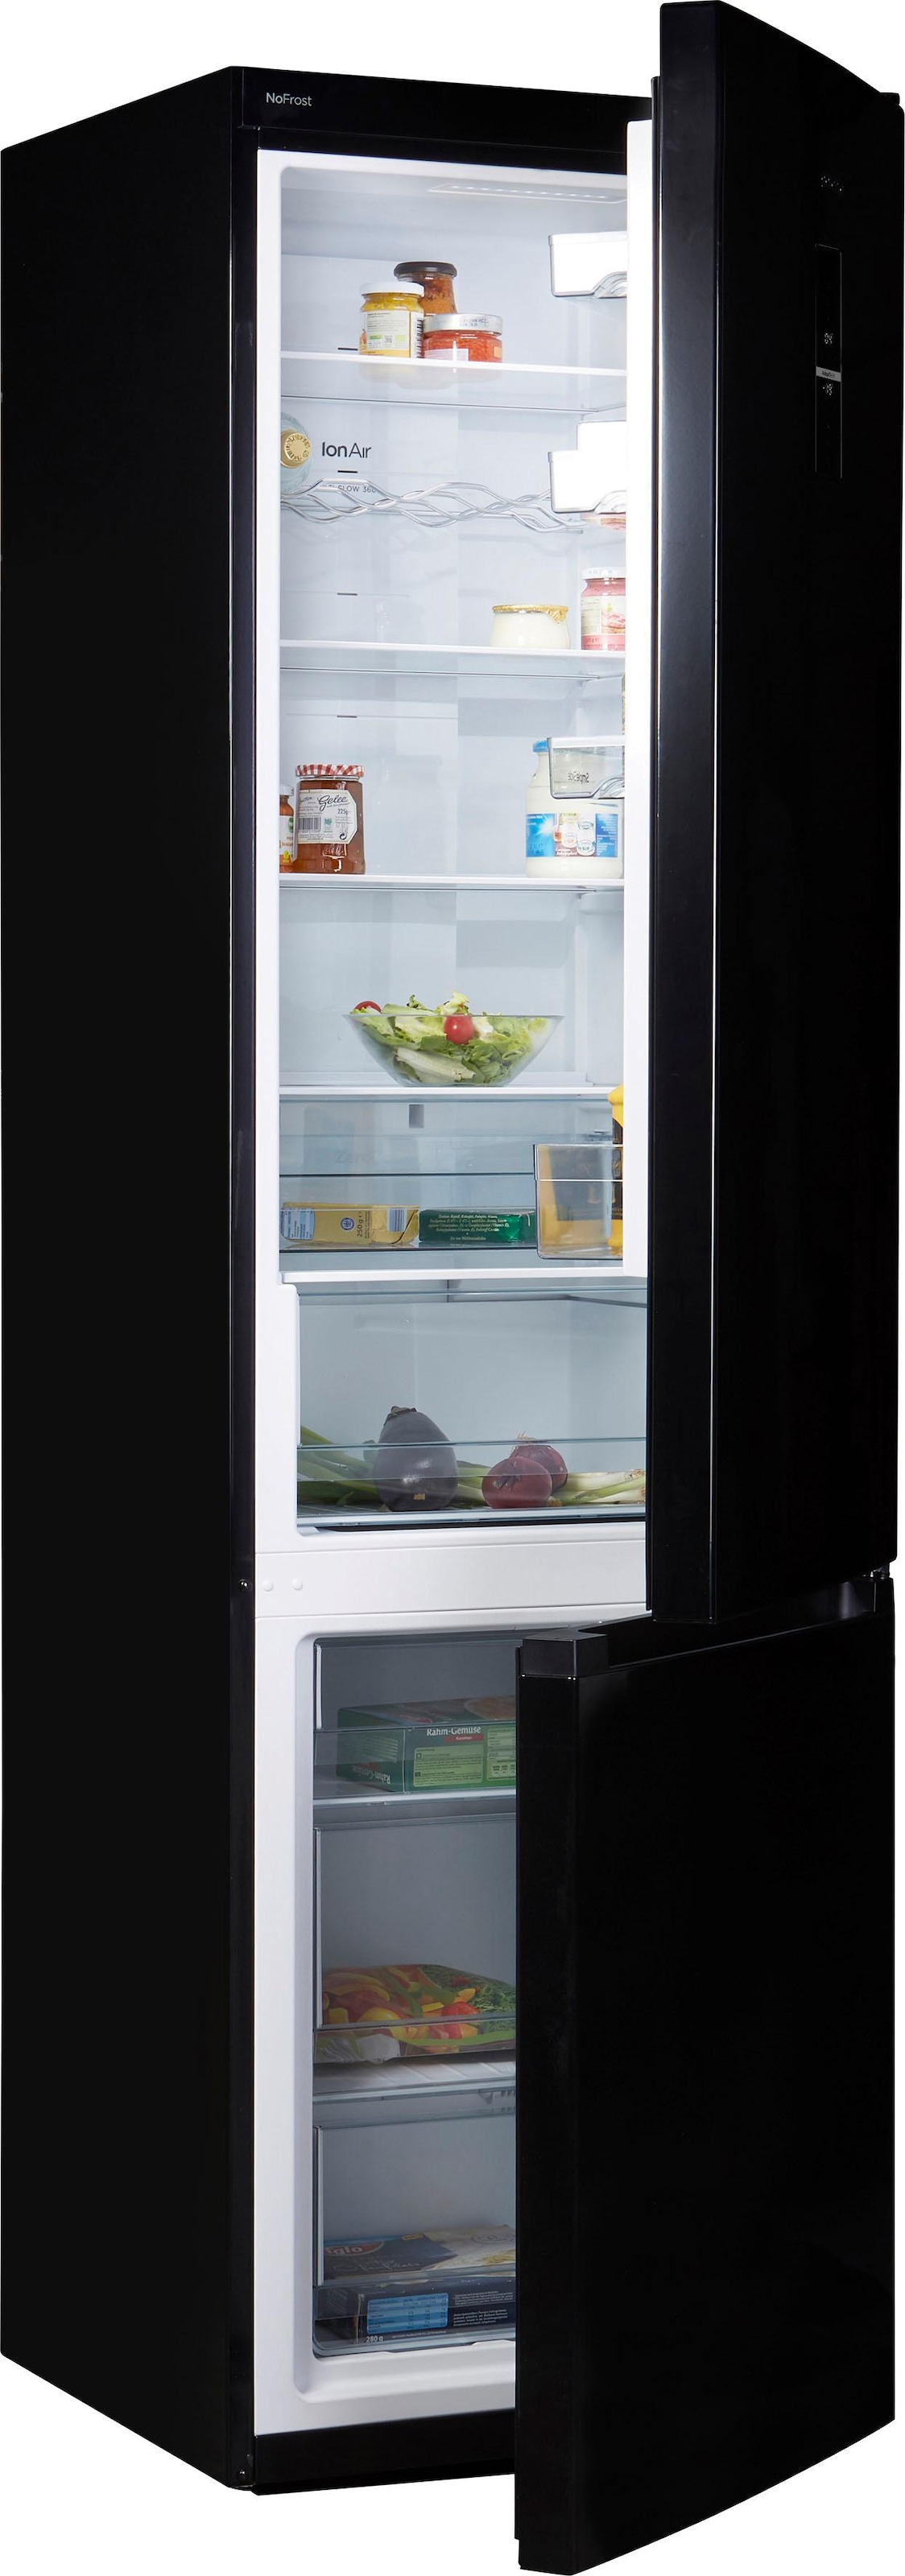 Gorenje Kühlschrank Ion Air : Gorenje kühlschränke onlineshop gorenje kühlschränke online